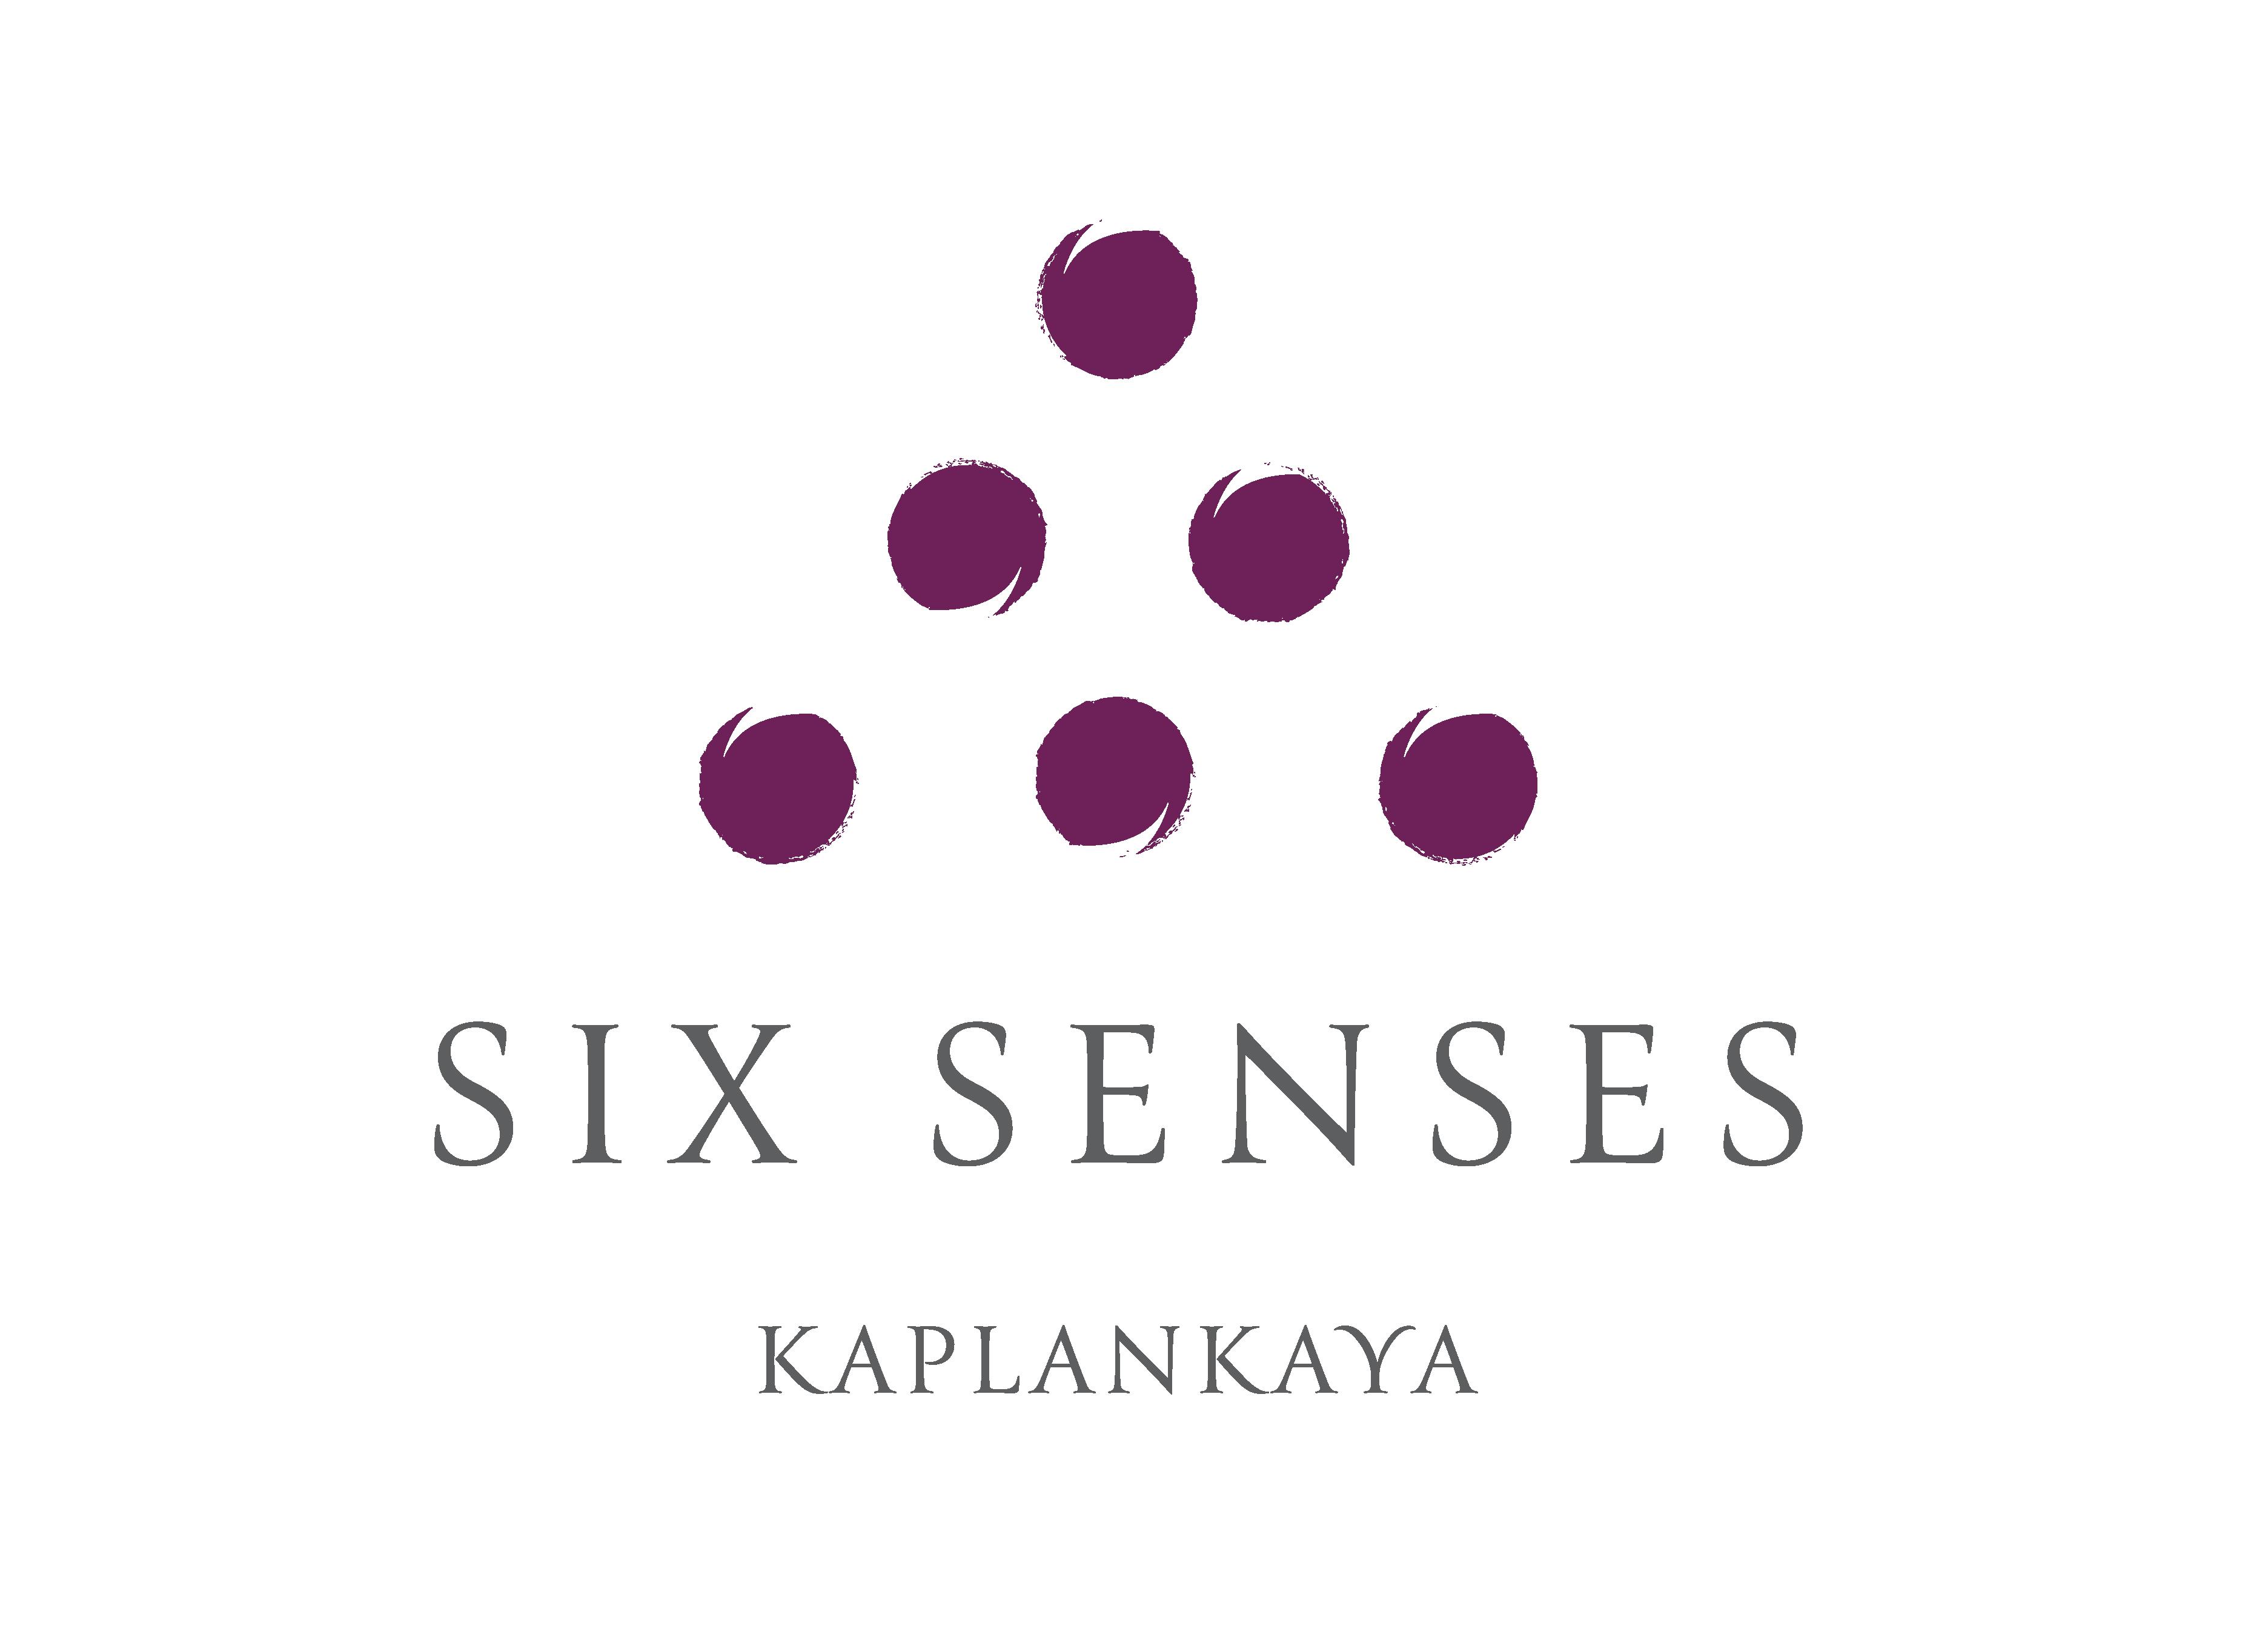 Six Senses Kaplankaya's Logo